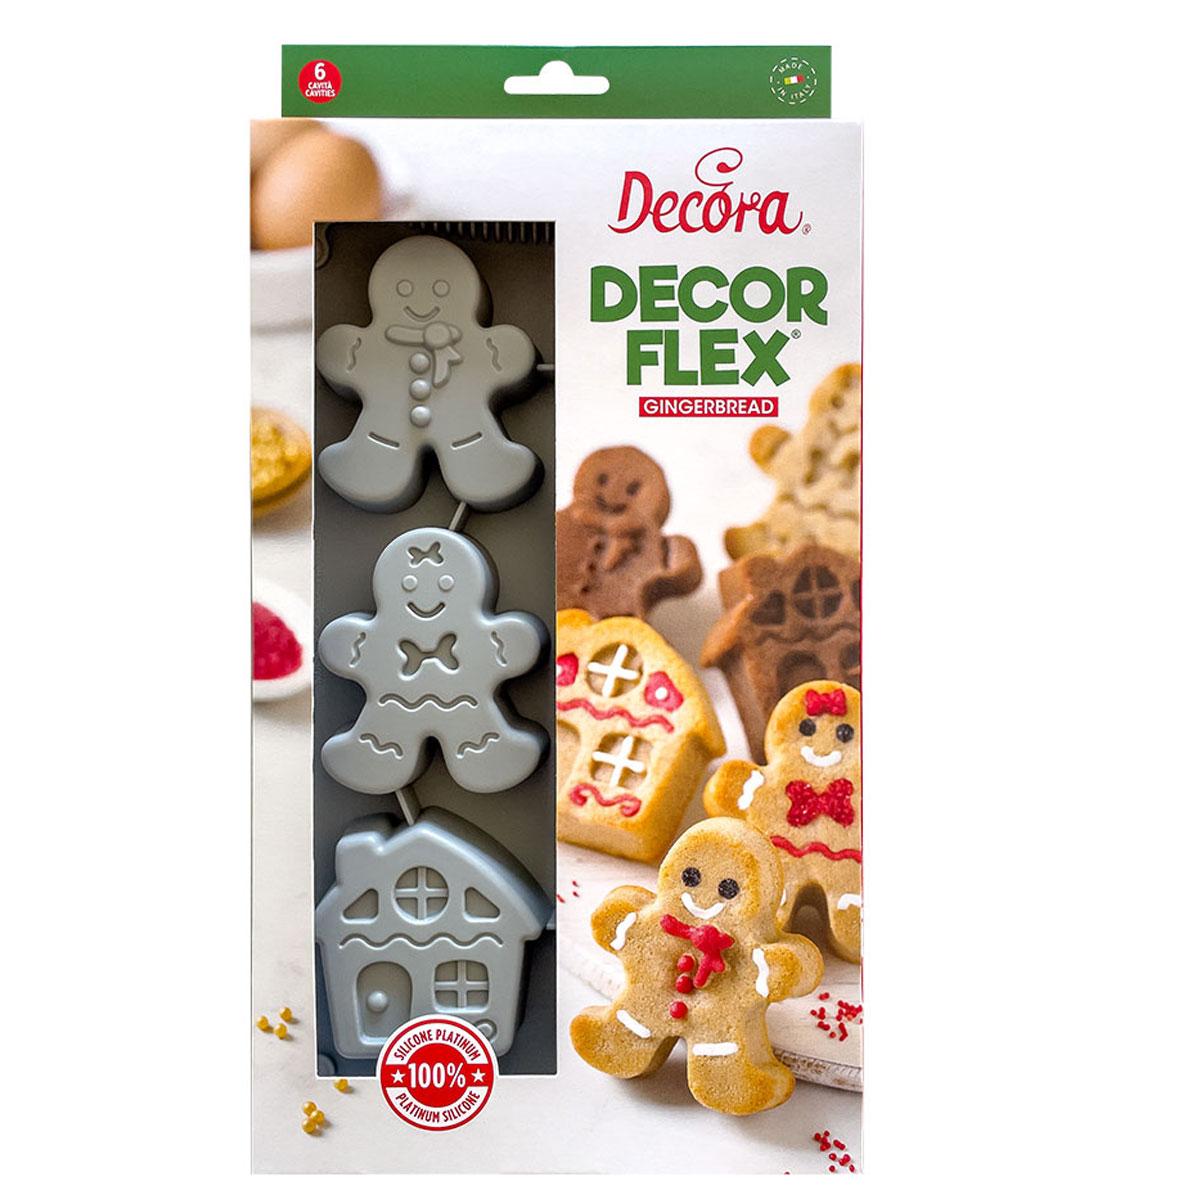 Decora Decorflex - Silikonbackform Gingerbread